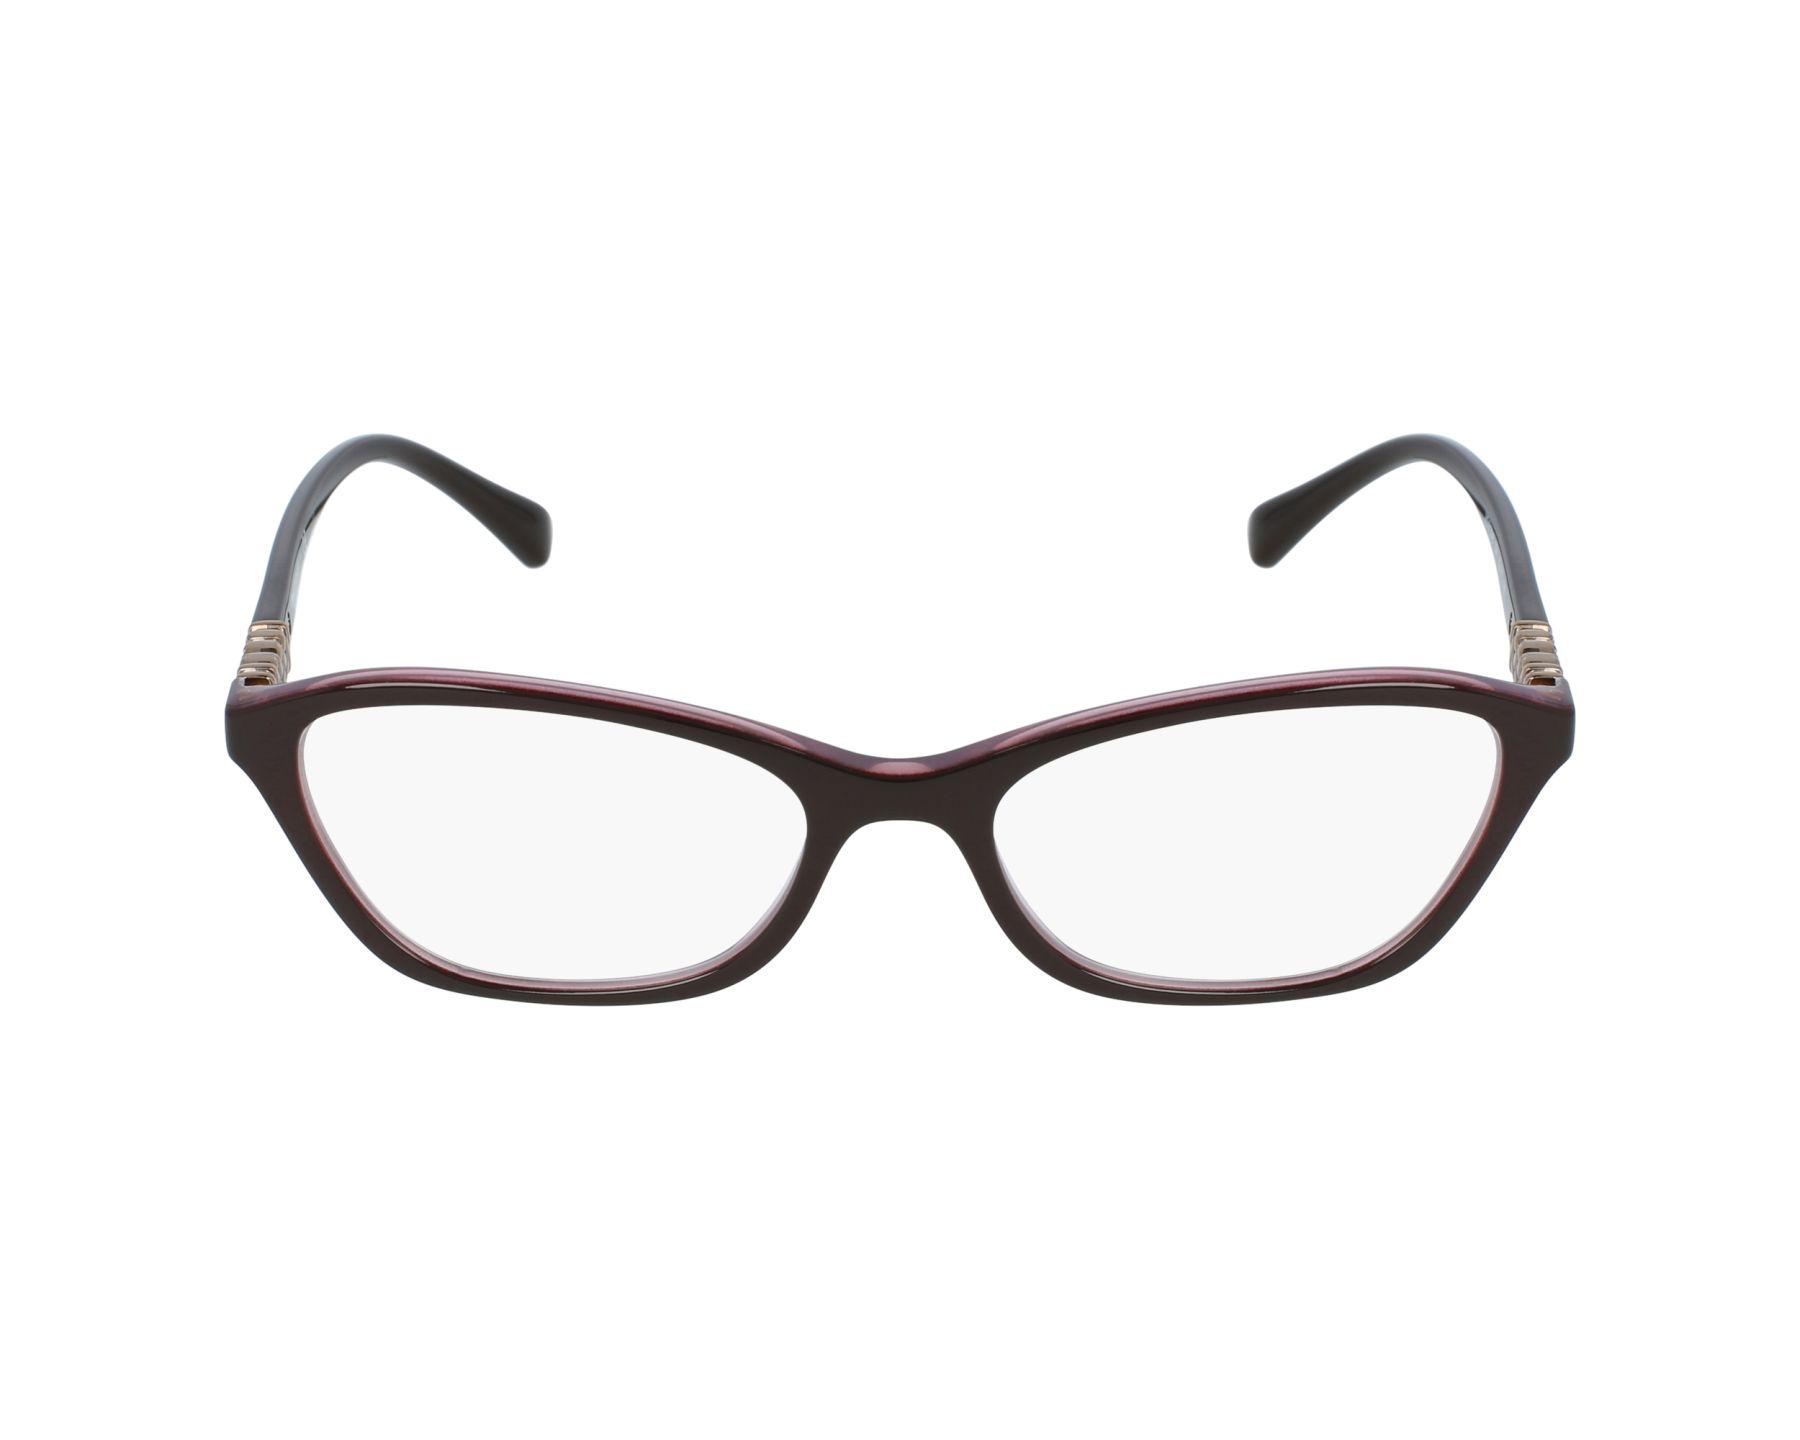 Vogue Eyeglasses Brown VO-5139-B 1941 - Visionet US